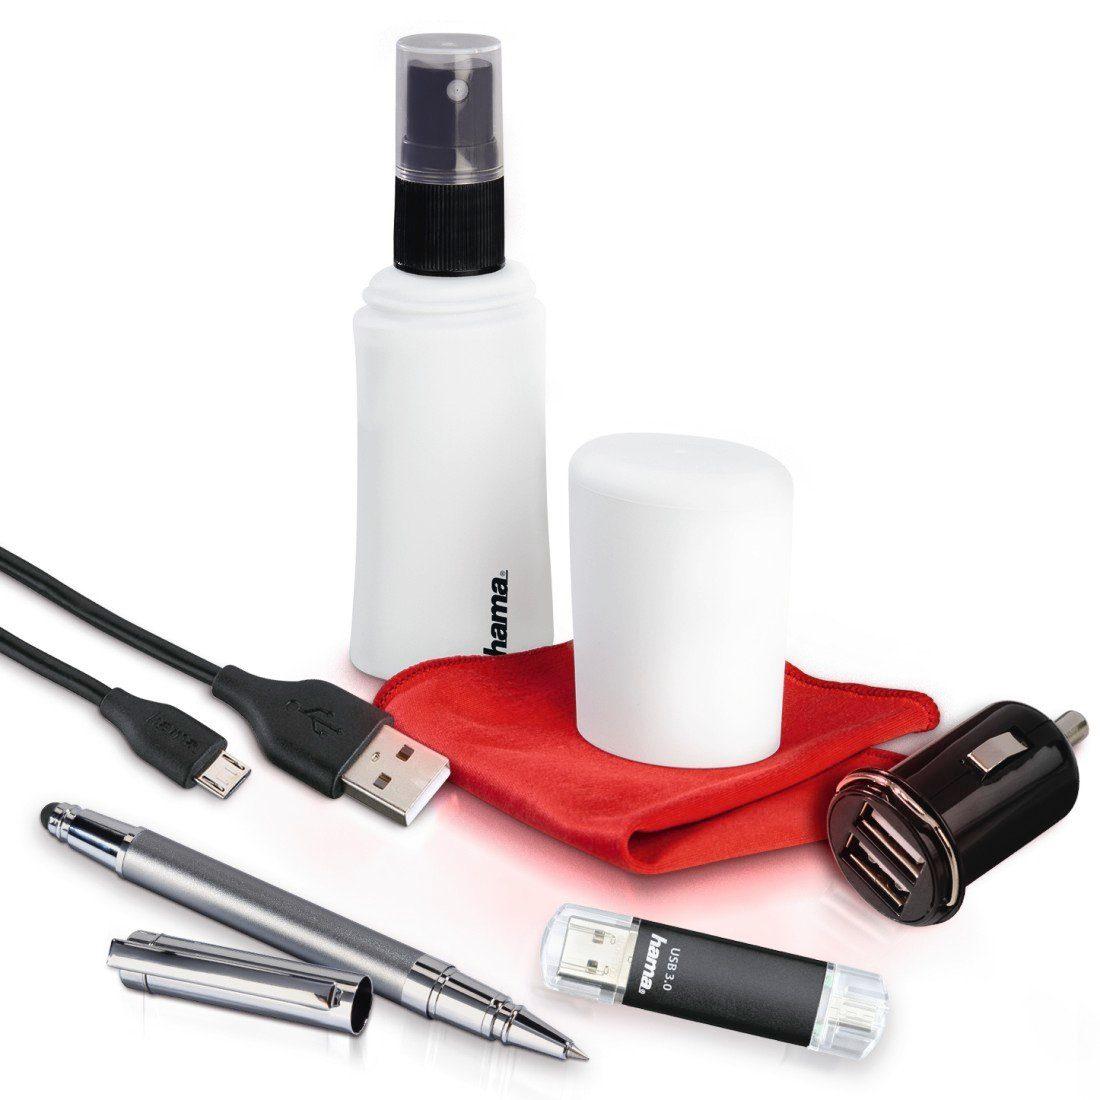 Hama Tablet/Handy Set 5-tlg: Kfz Ladegerät, microUSB Kabel USB- »Stick Eingabestift Reinigung«